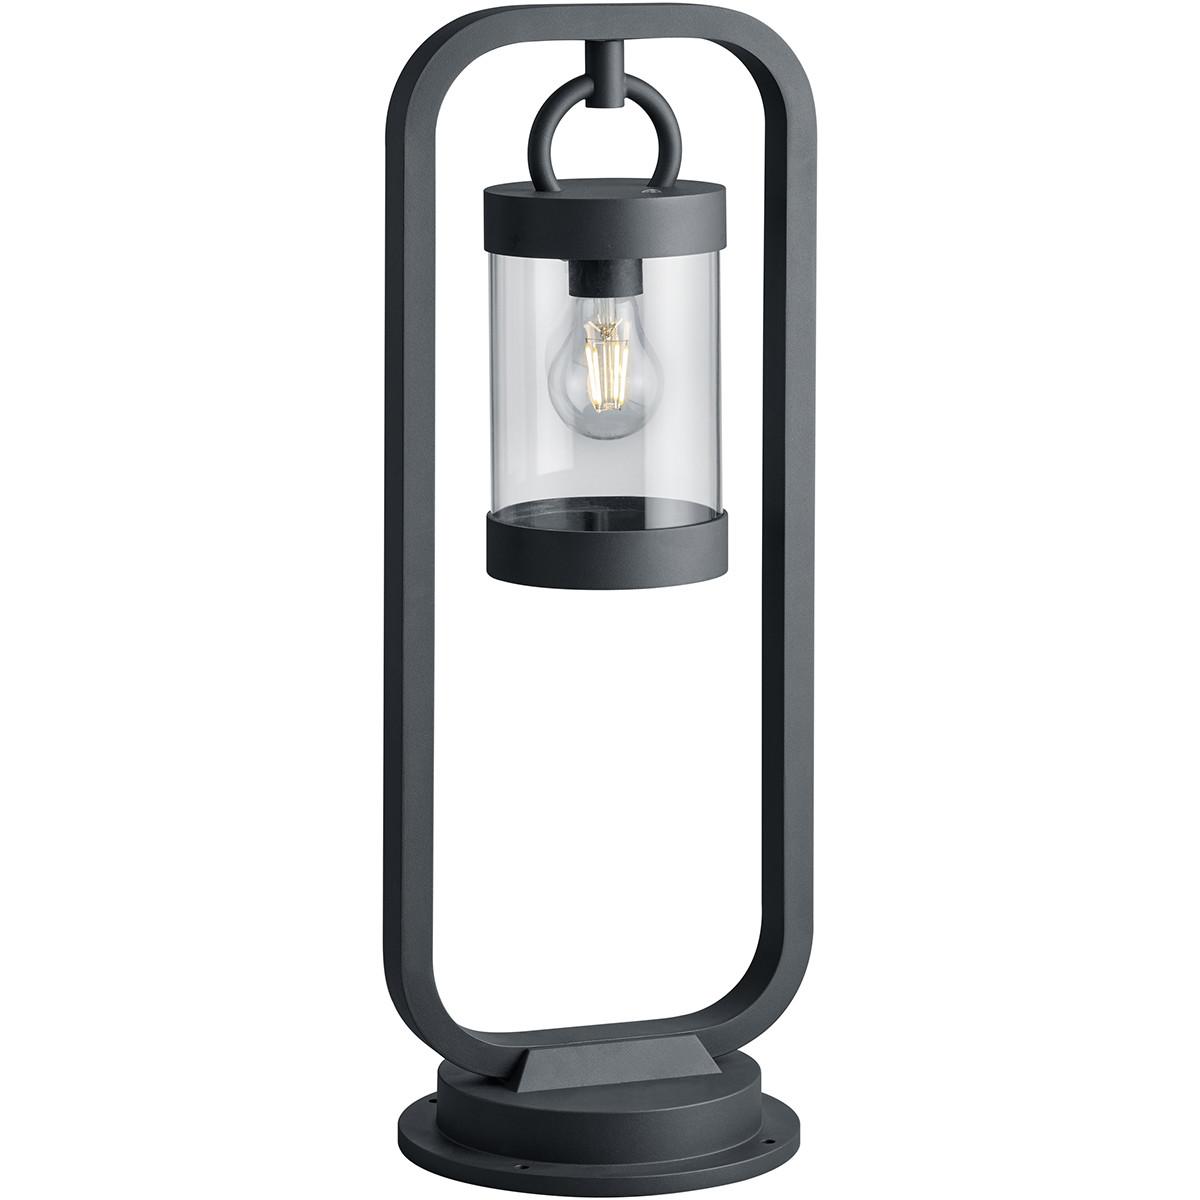 LED Tuinverlichting - Buitenlamp - Trion Semby - Staand - Lichtsensor - E27 Fitting - Mat Zwart - Al